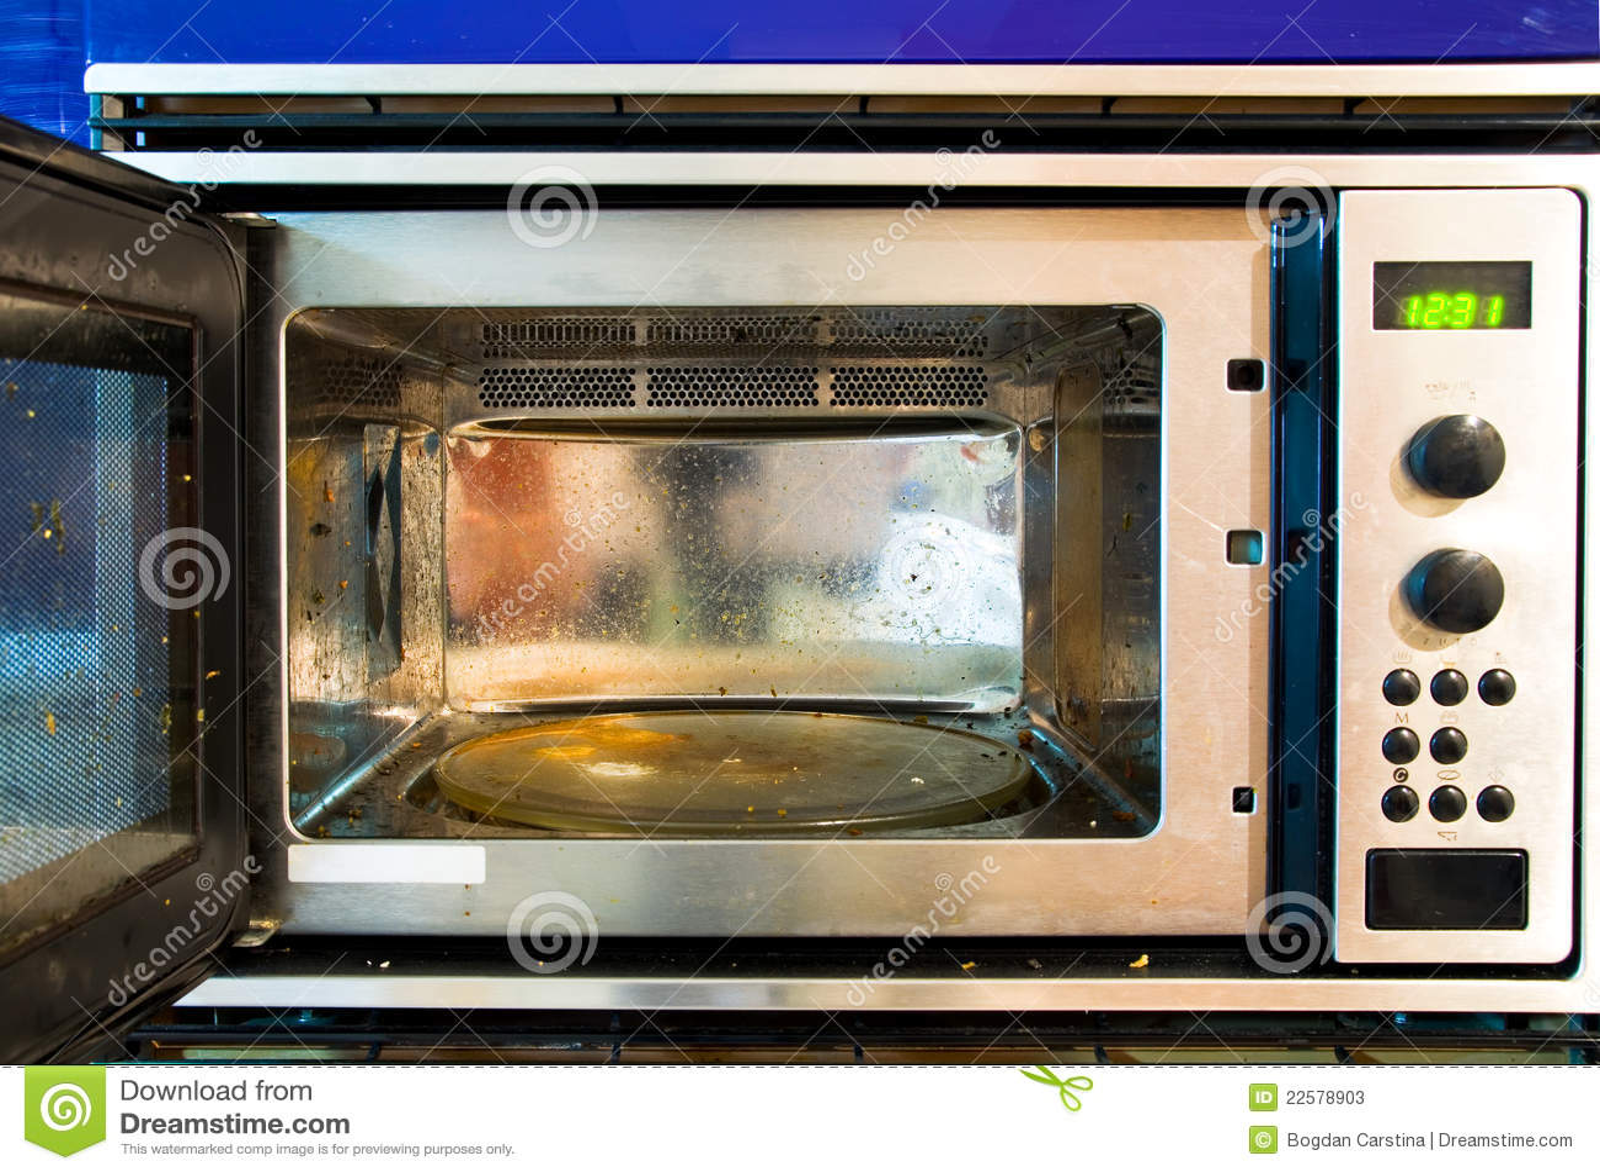 Dirty Microwave Oven ~ Dirty microwave oven stock photos image